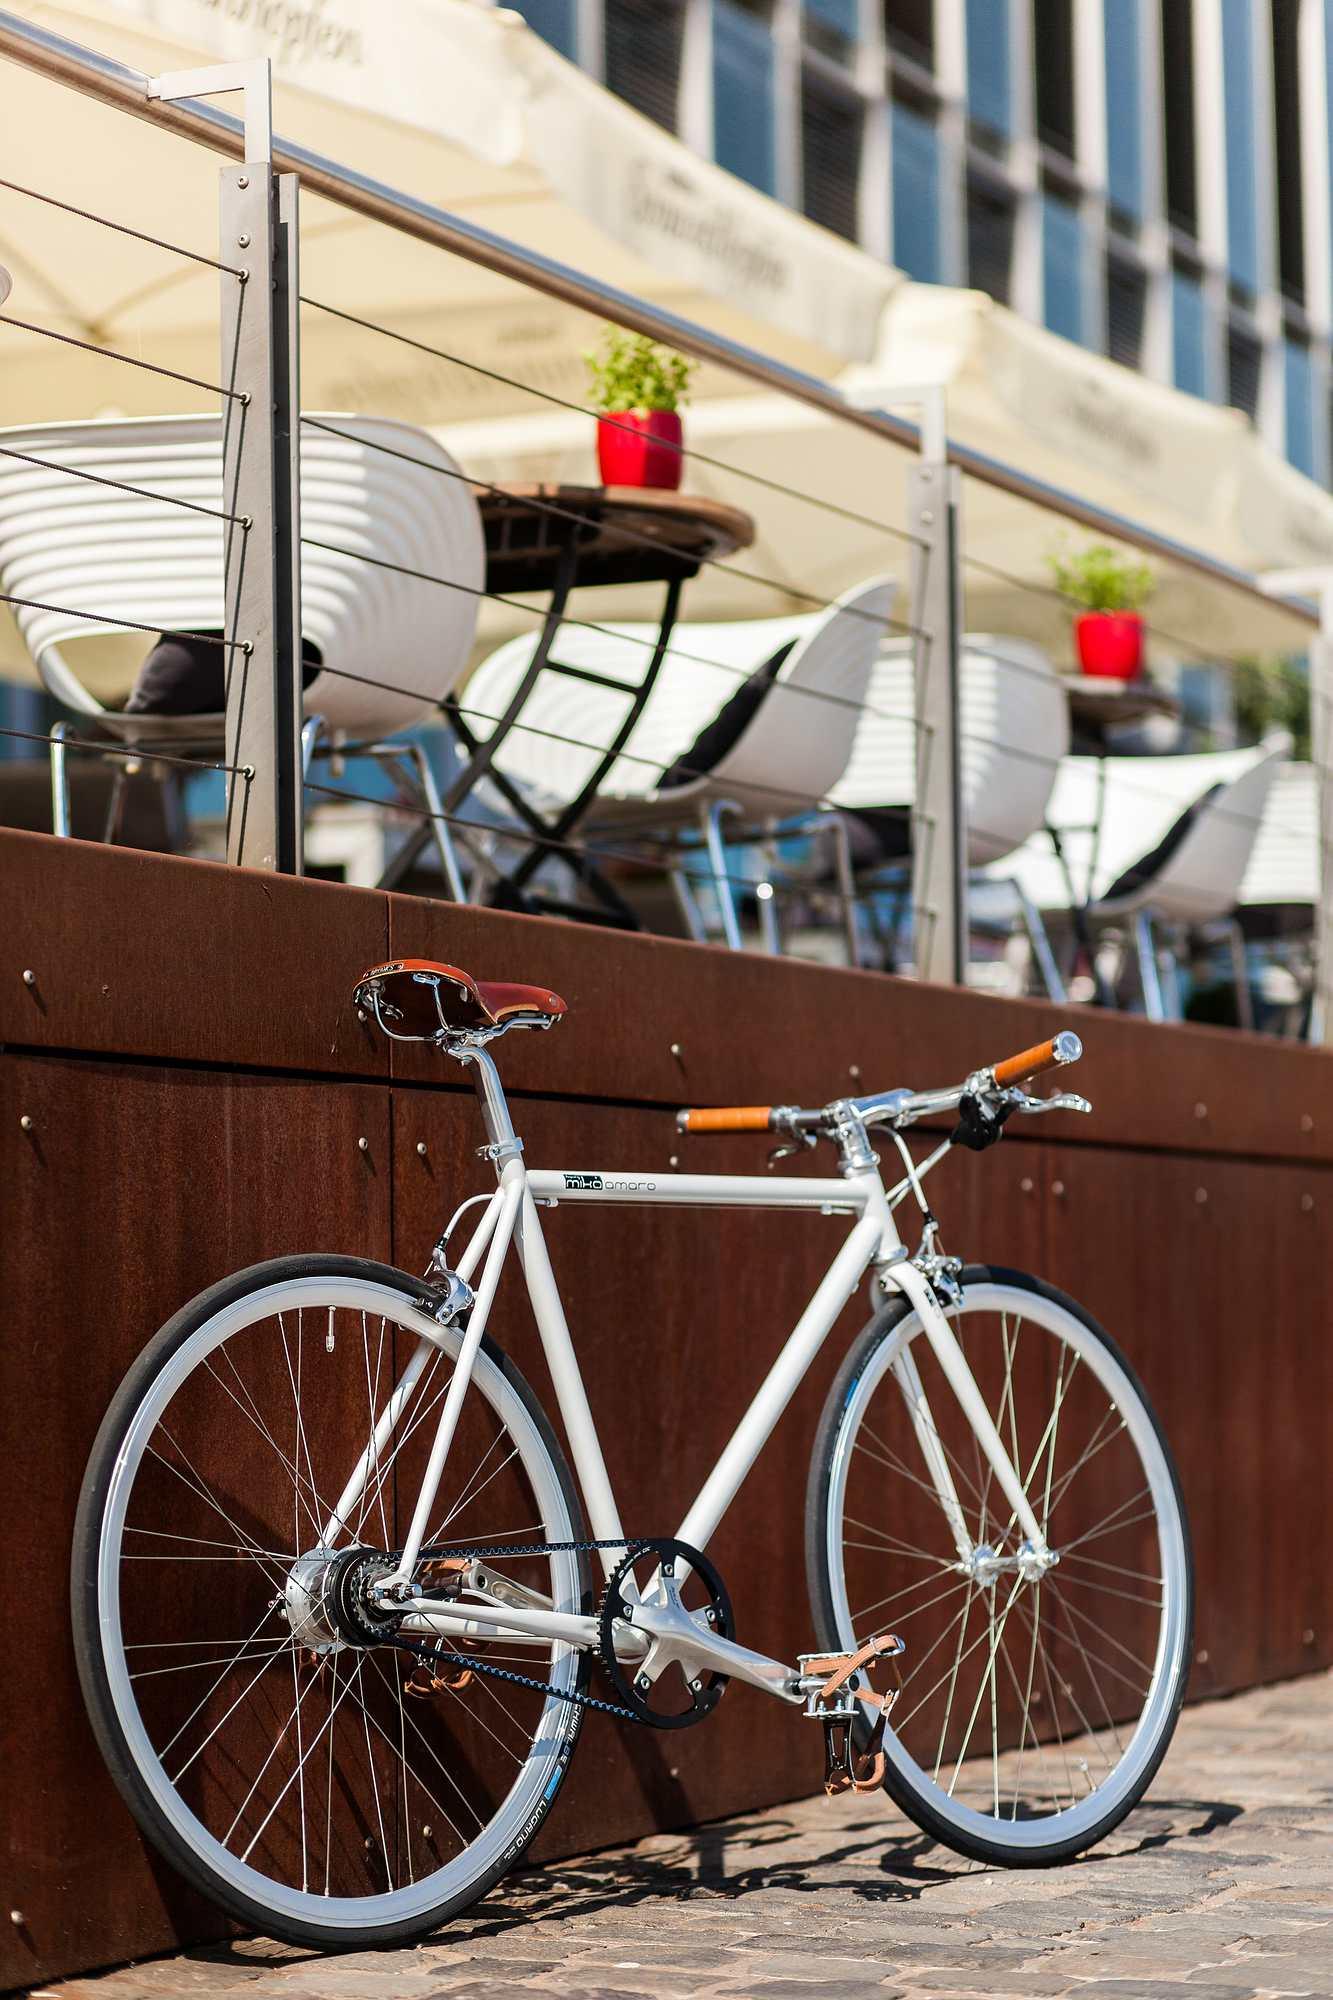 Urban Bike indy white 8 Speed Shimano Alfine, Brooks